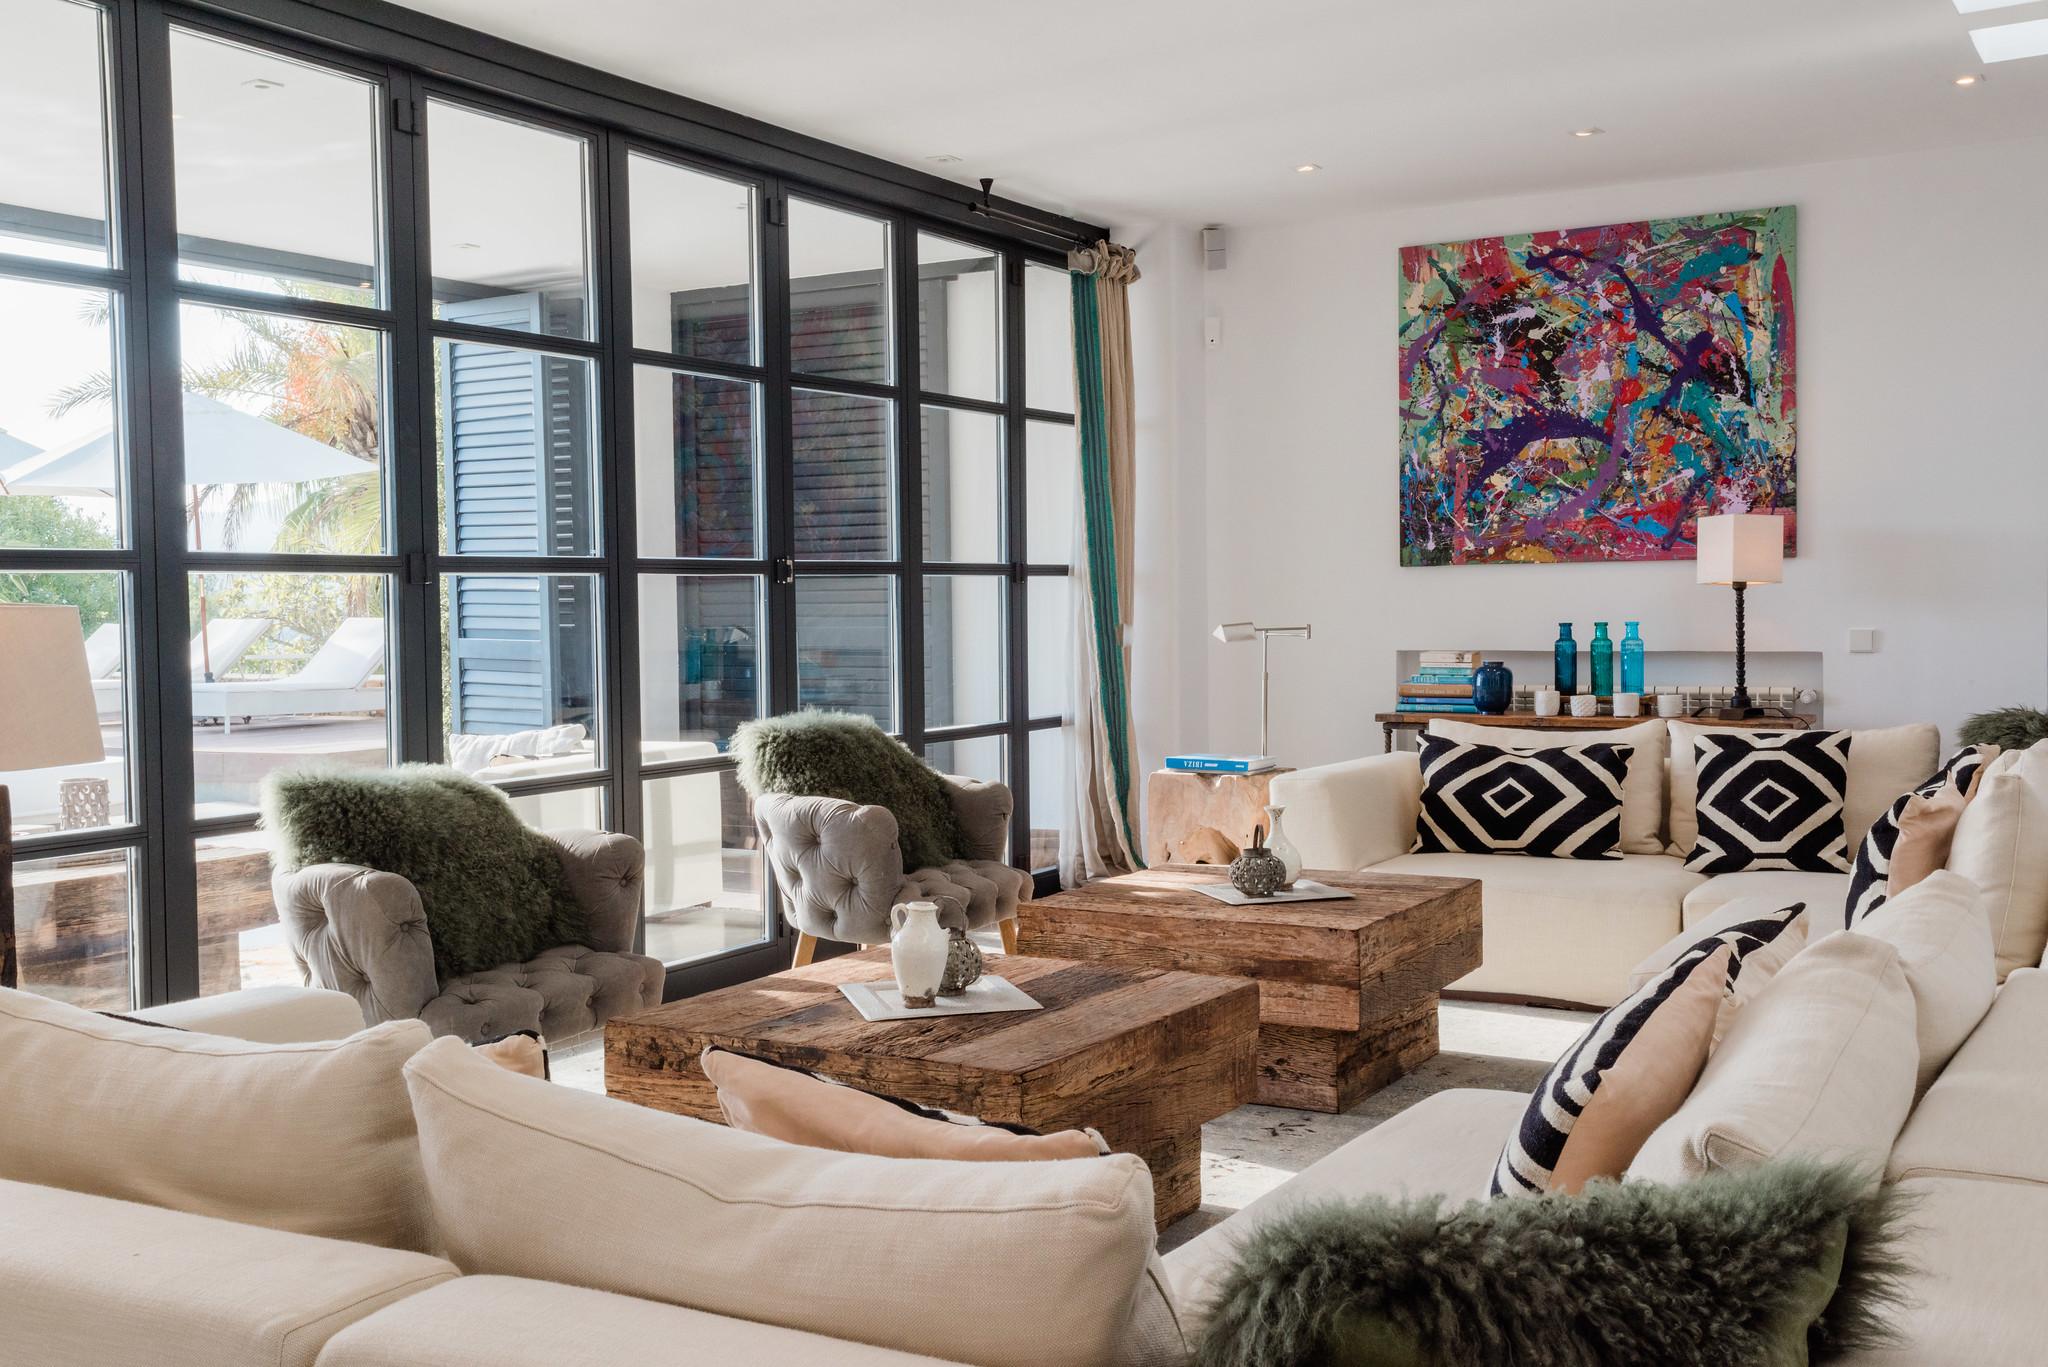 https://www.white-ibiza.com/wp-content/uploads/2020/05/white-ibiza-villas-casa-amalia-interior-living-area.jpg